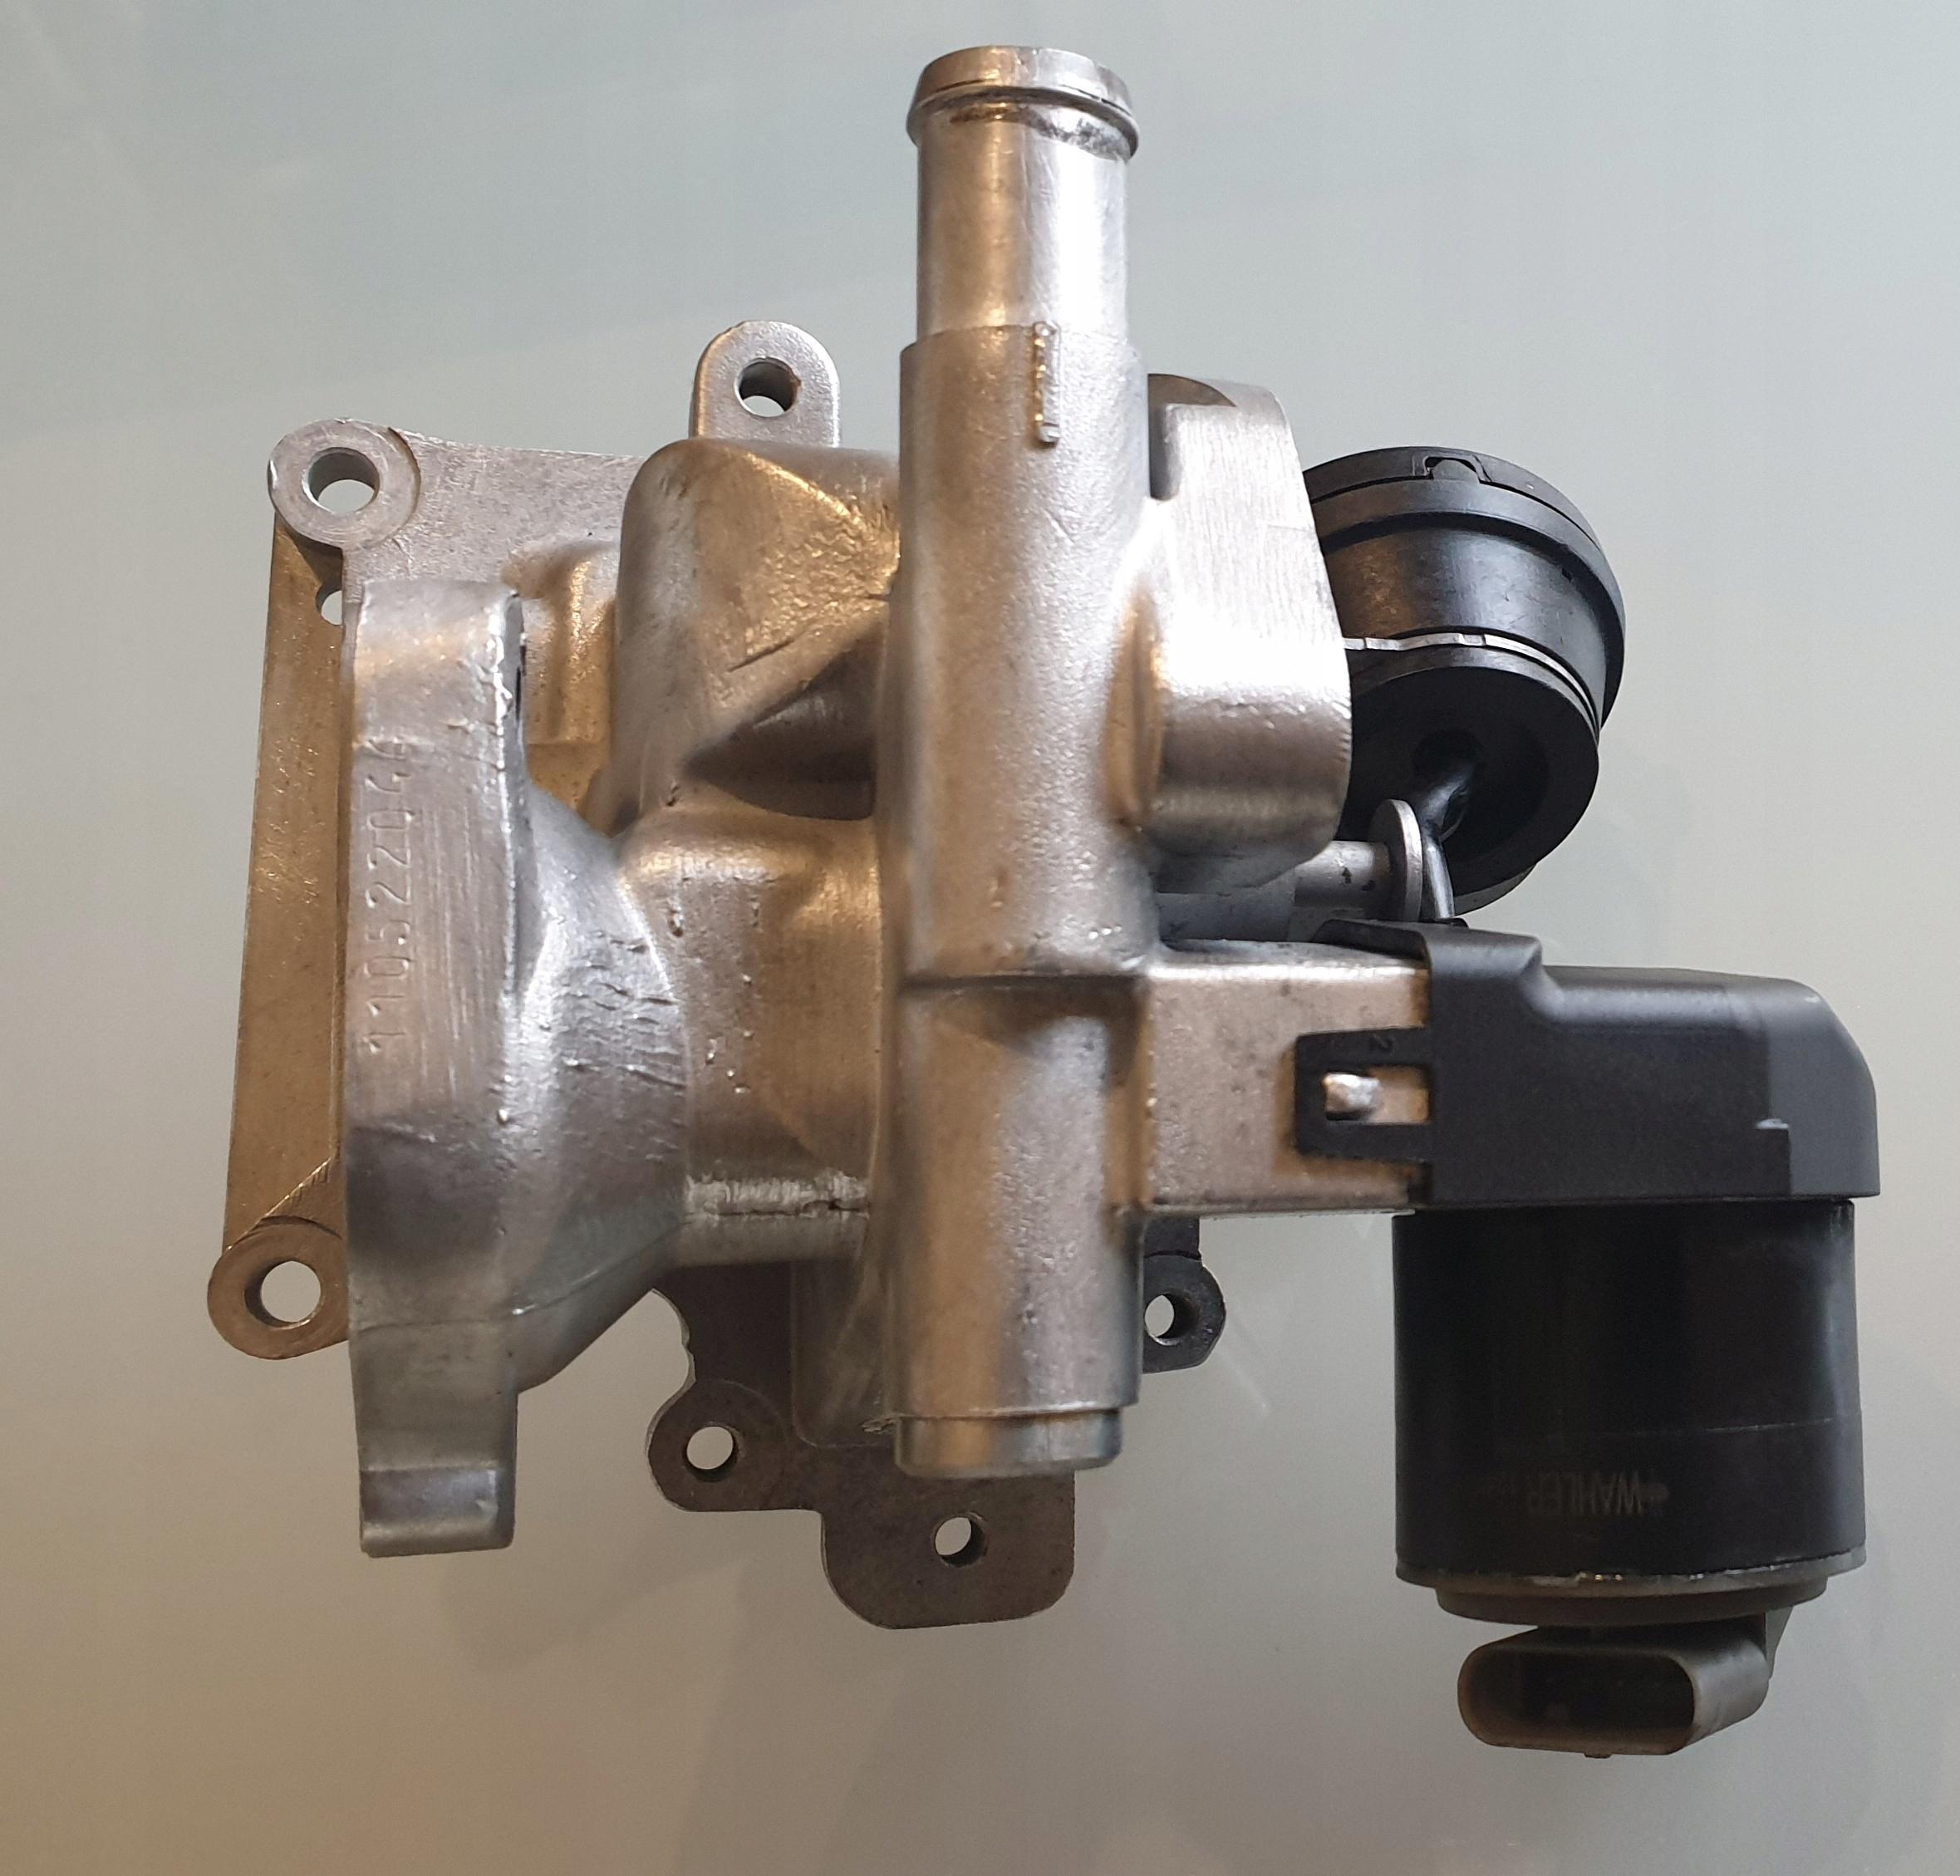 клапан системы рециркуляции ог volvo v40 xc60 s60 v70 xc90 gwaranc 1rok